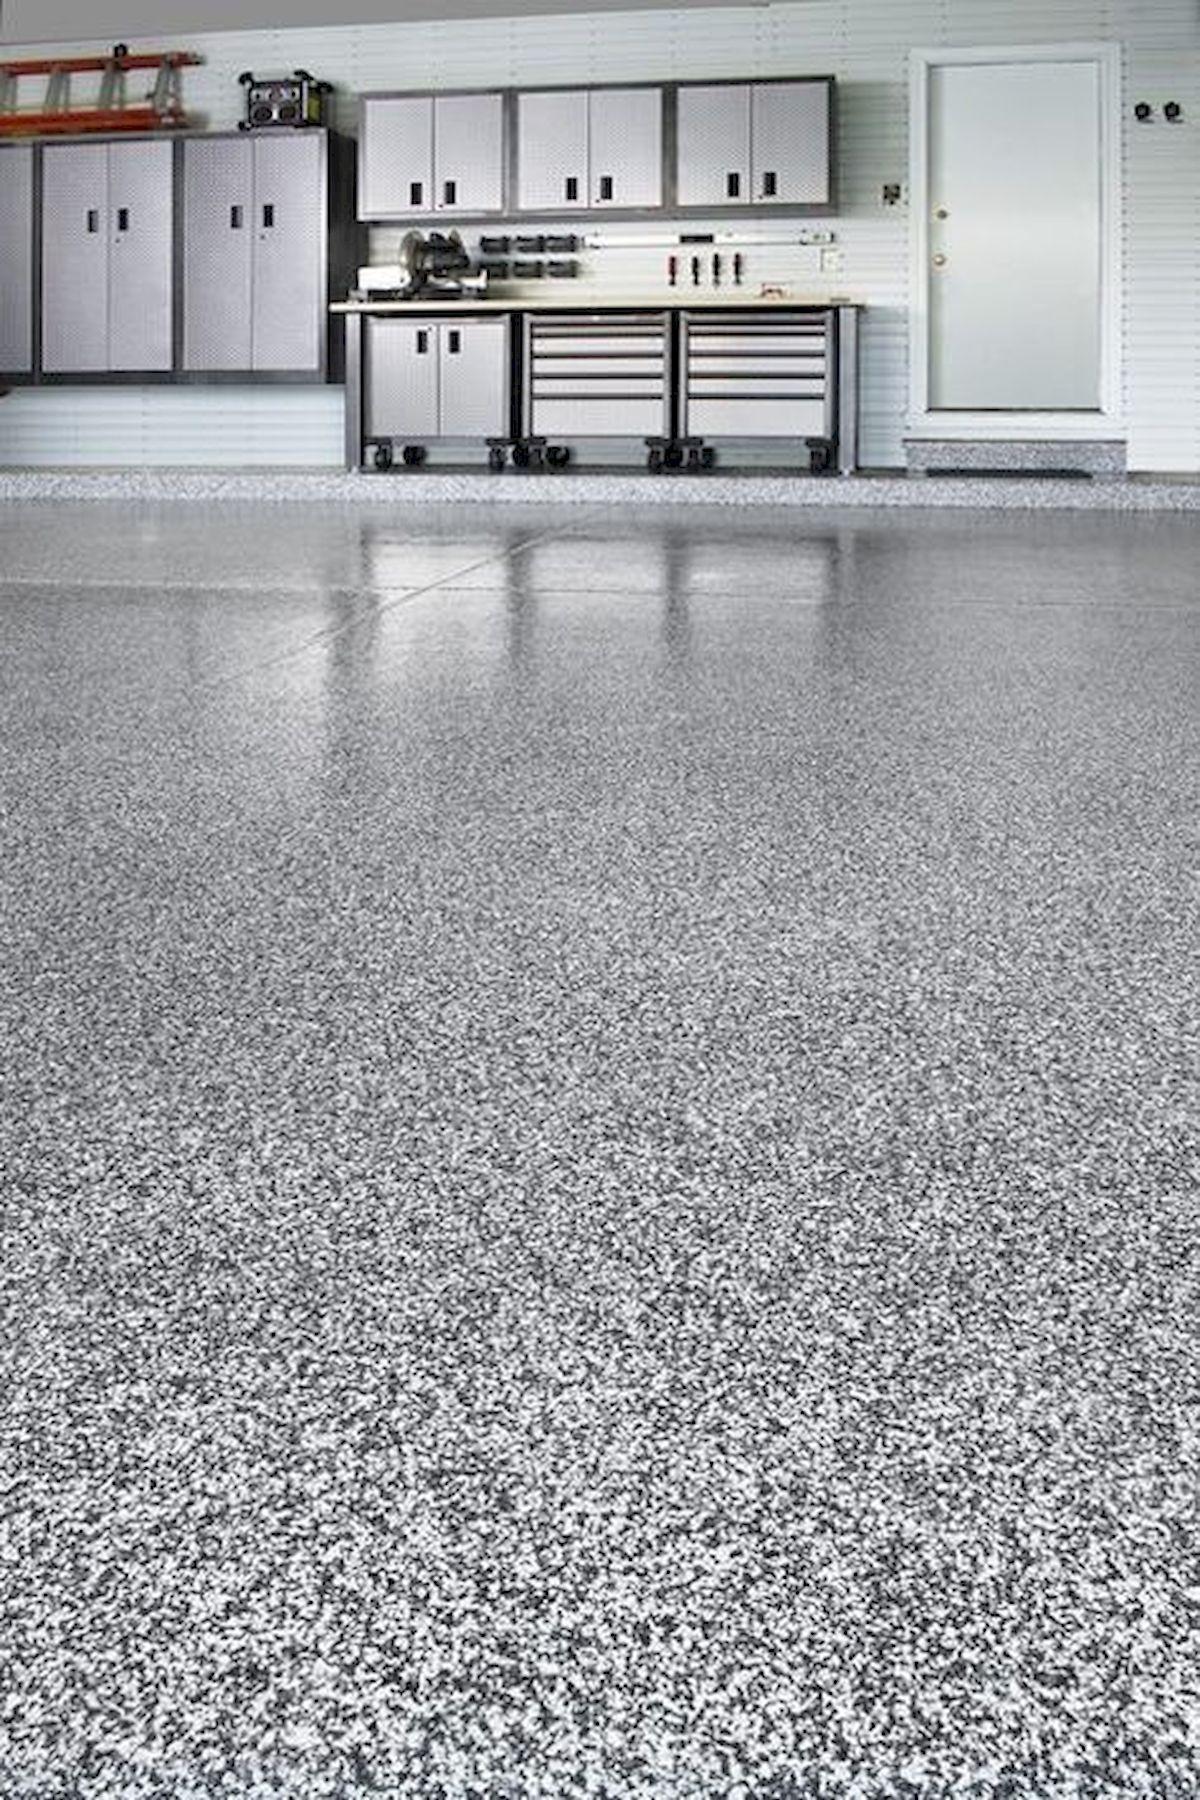 70 Smooth Concrete Floor Ideas For Interior Home (1)